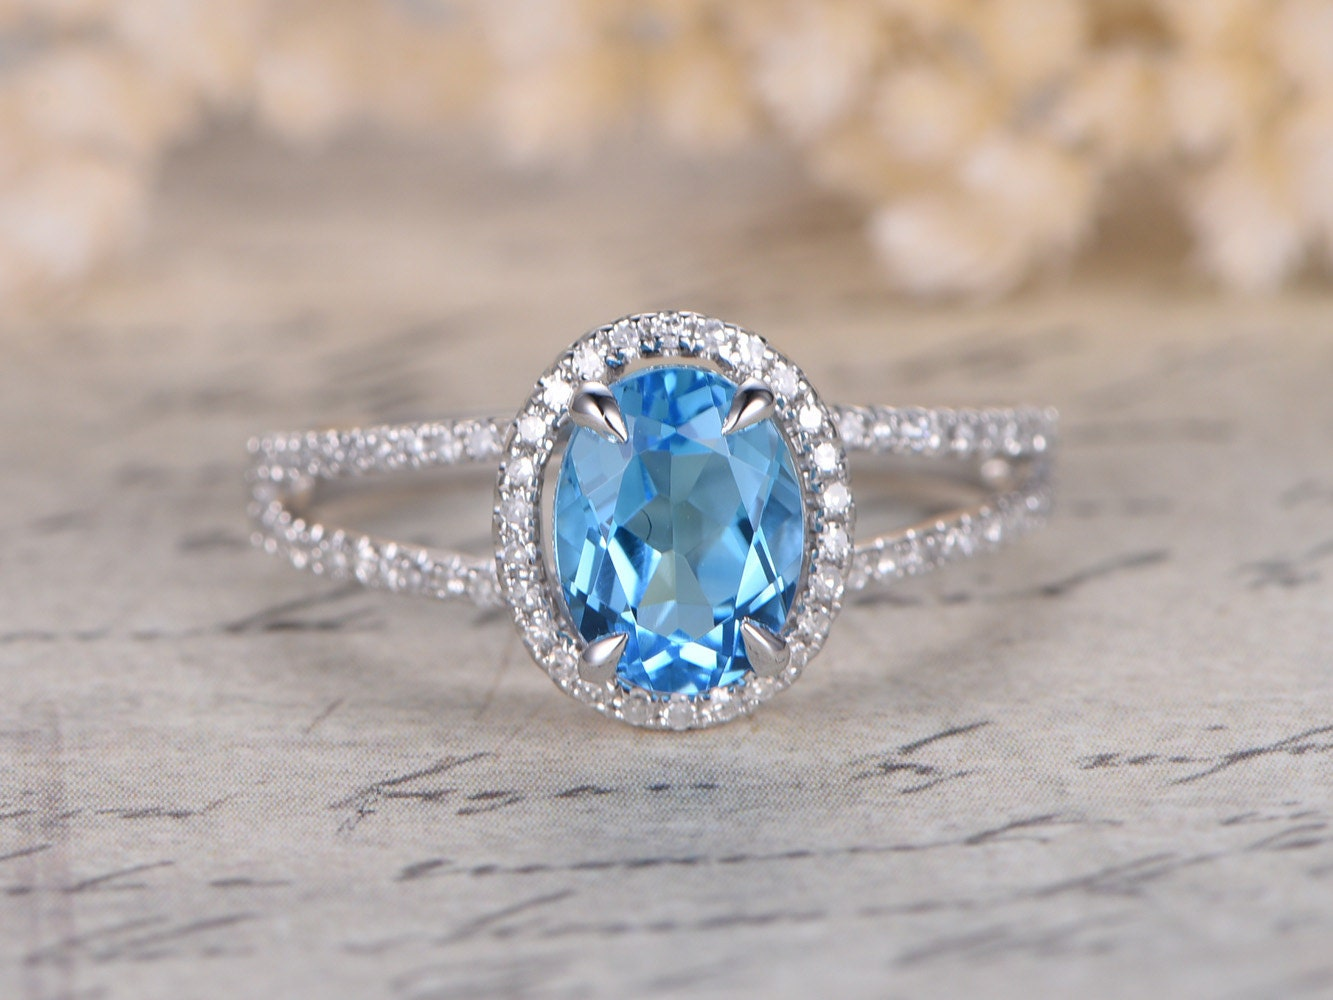 6x8mm Oval Cut Sky Blue Topaz Engagement Ring Split Shank